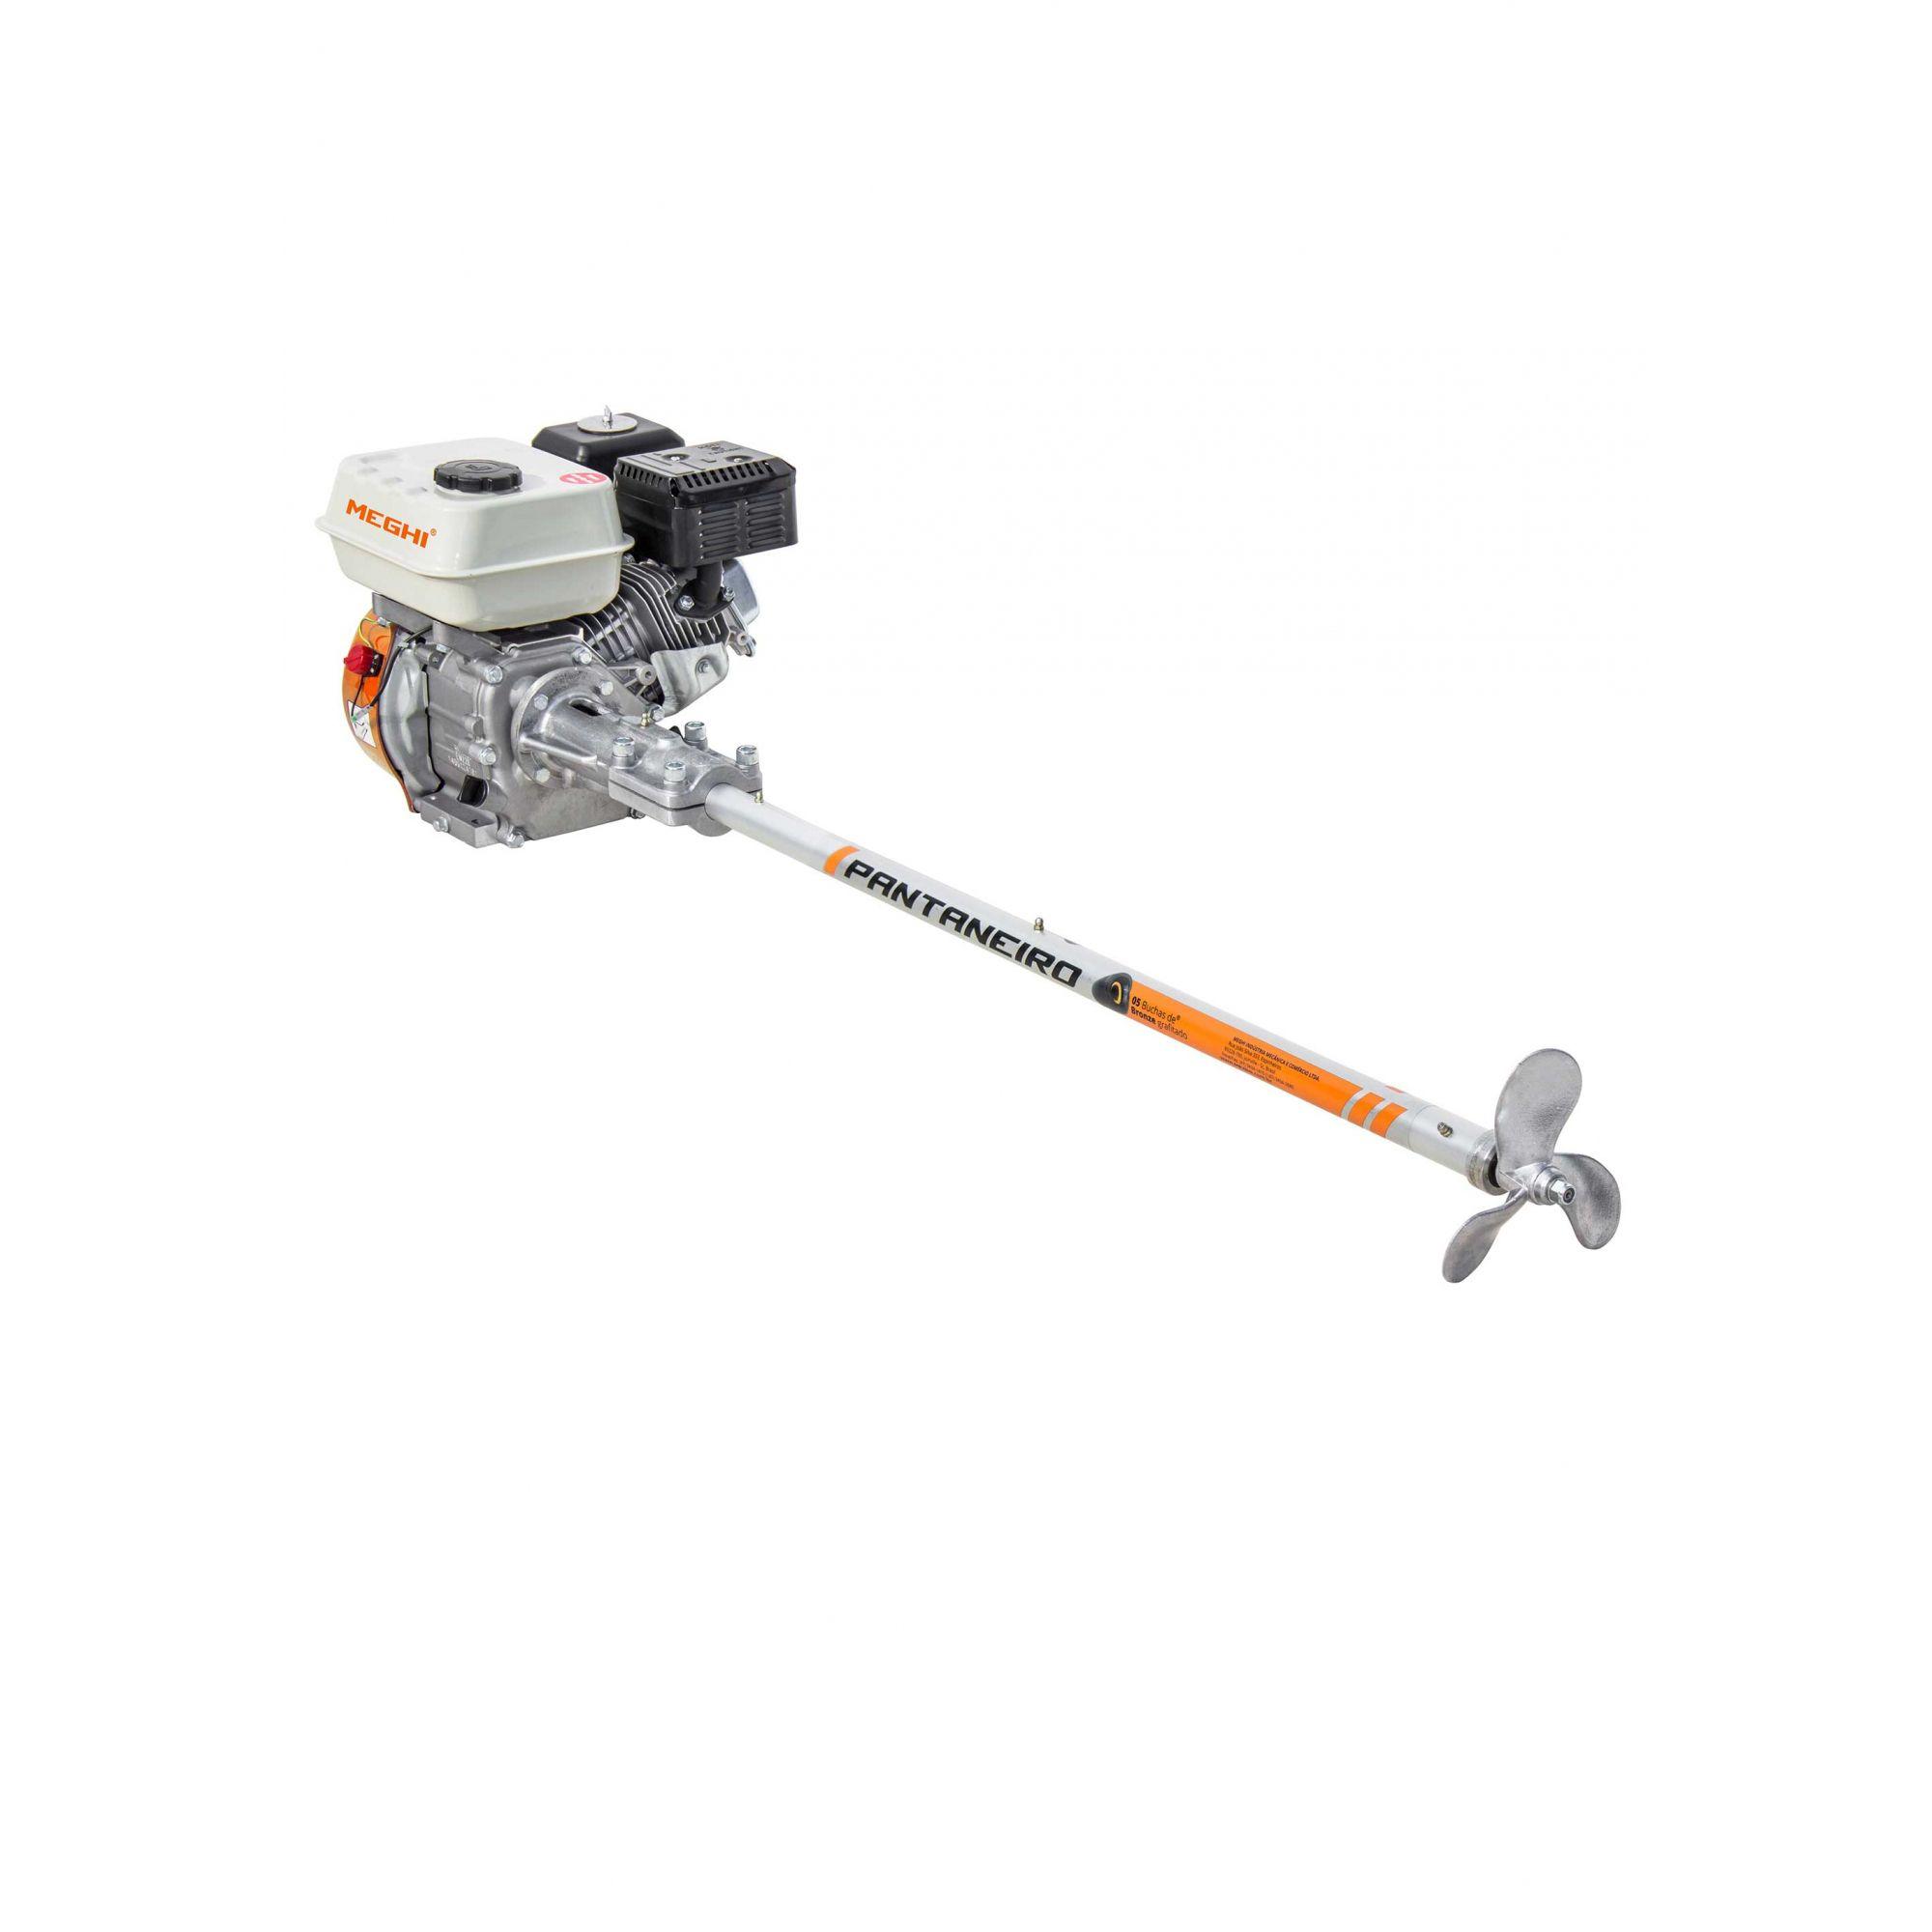 Kit Motor De Centro Barco Bote 2,20mt P/ Motor 5,5/6,5/7,0hp